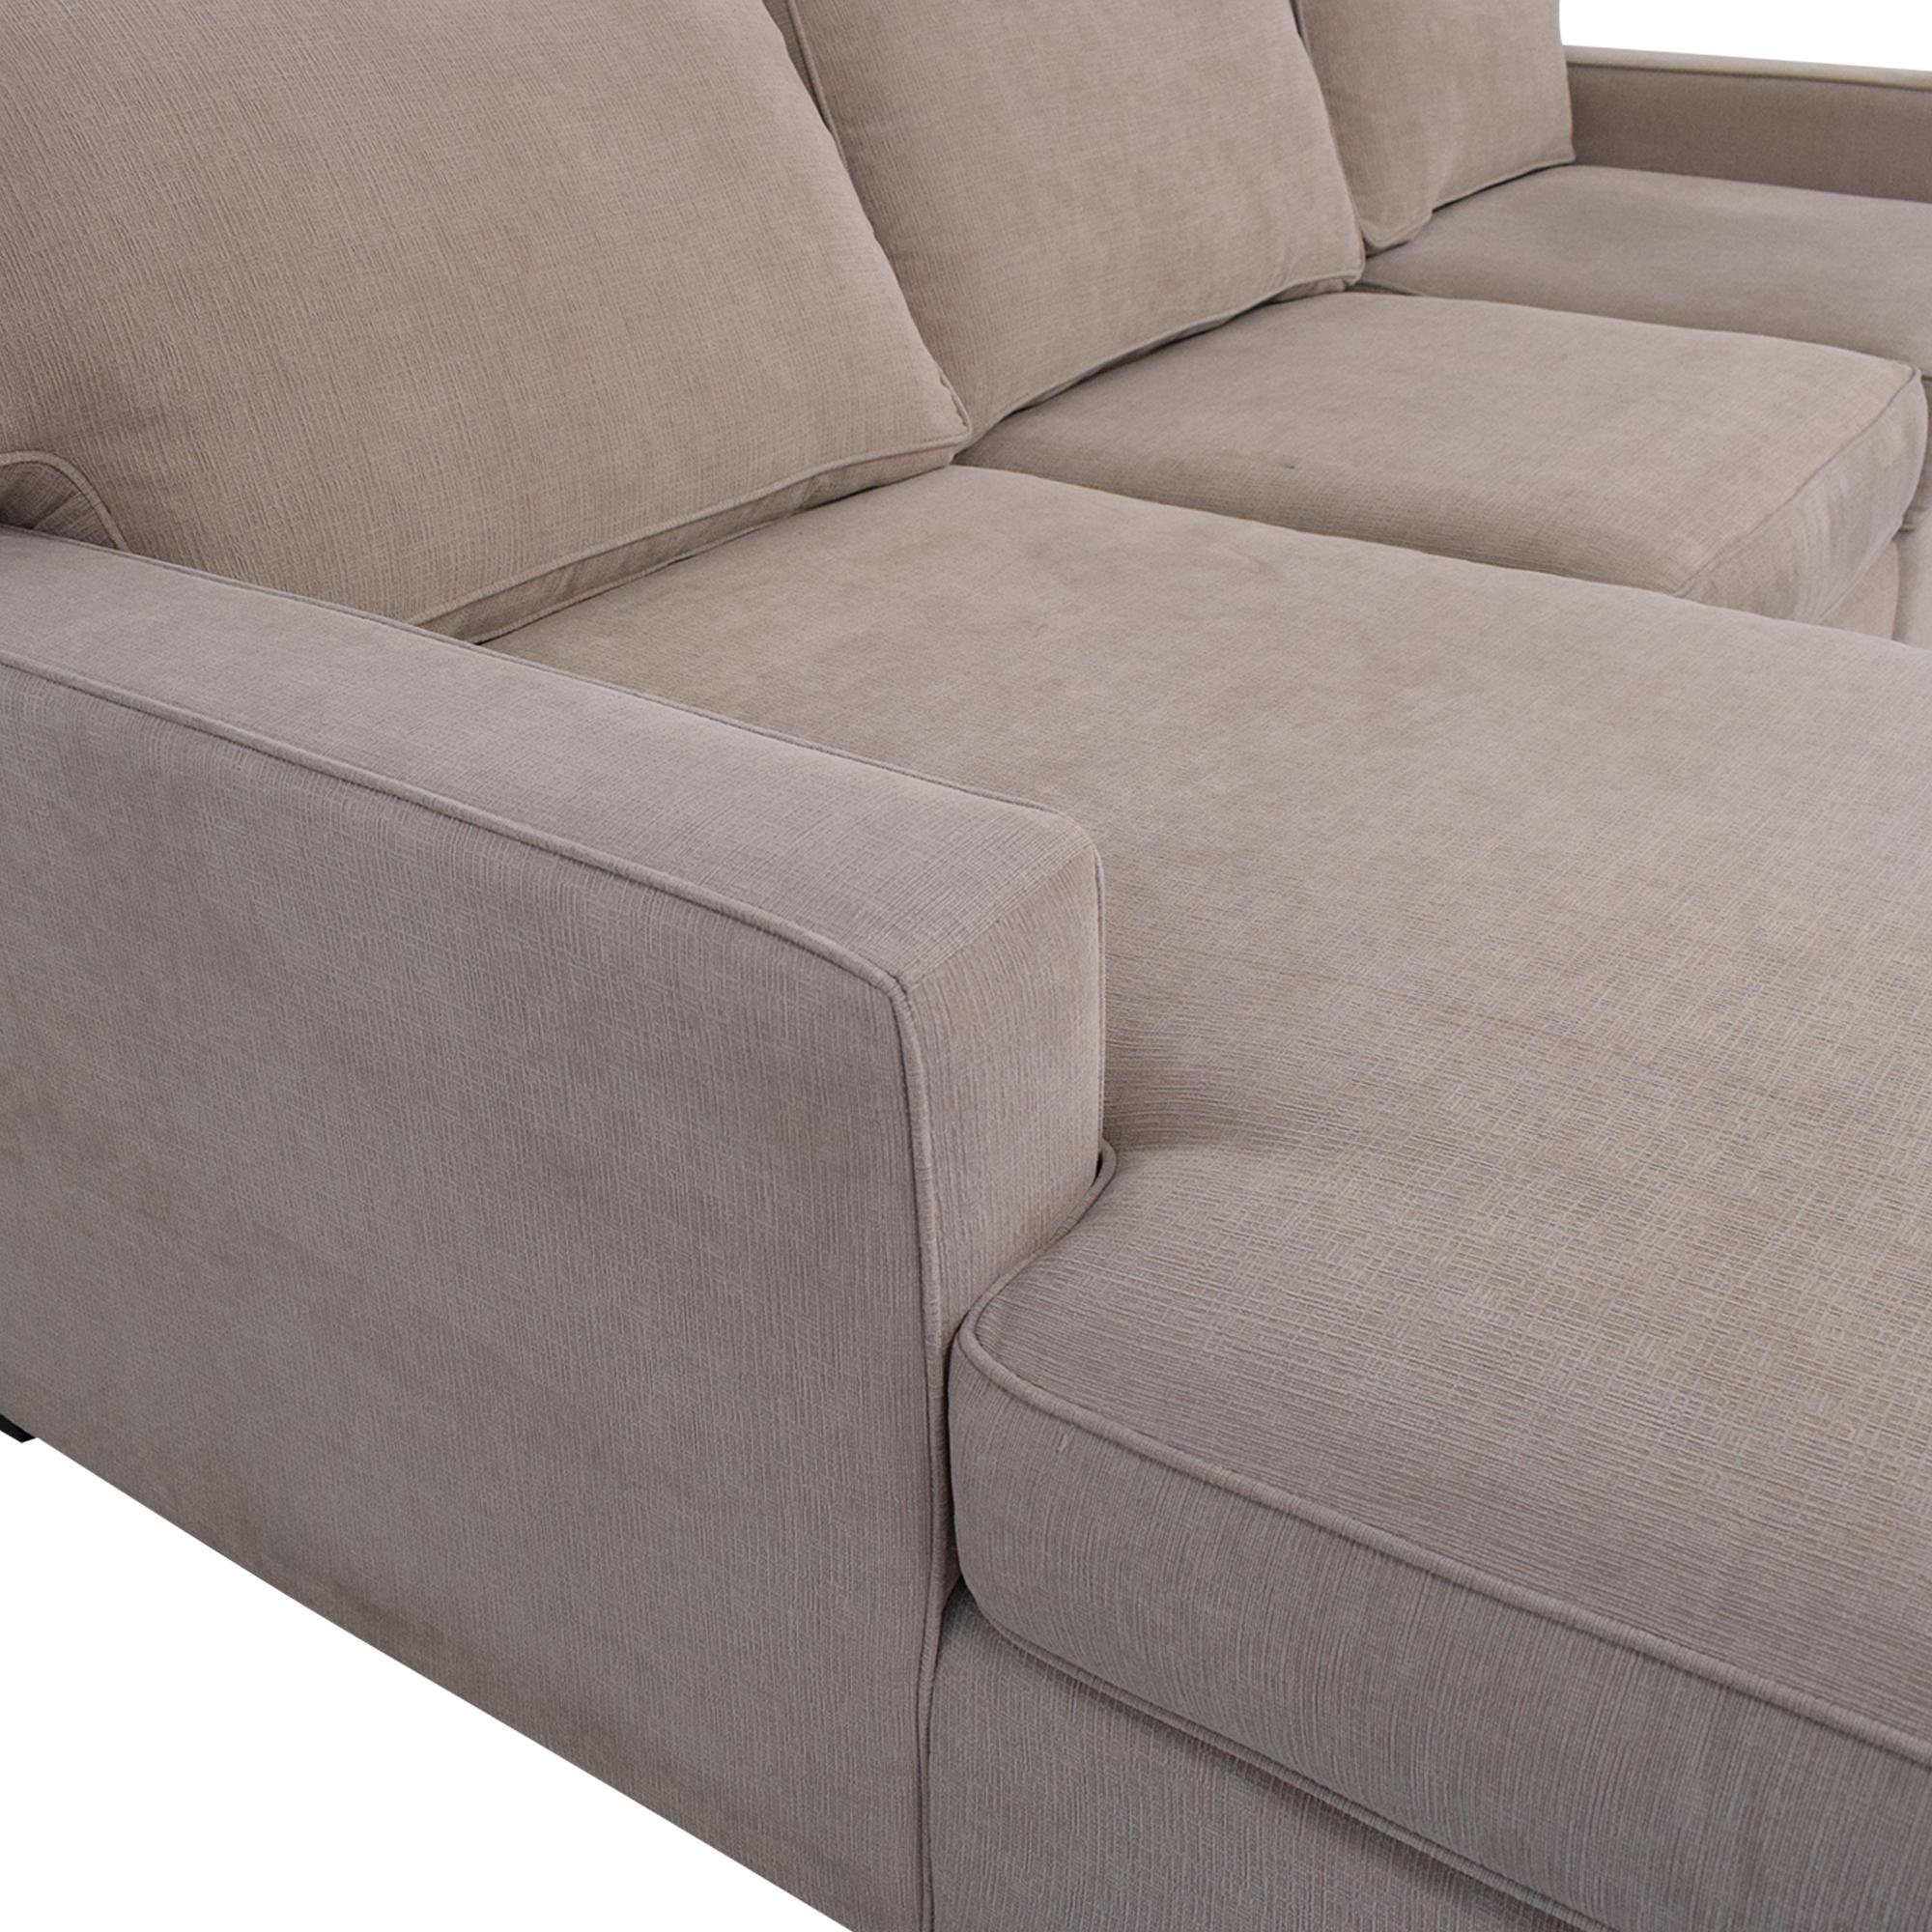 Macy's Macy's Chaise Sectional Sofa price